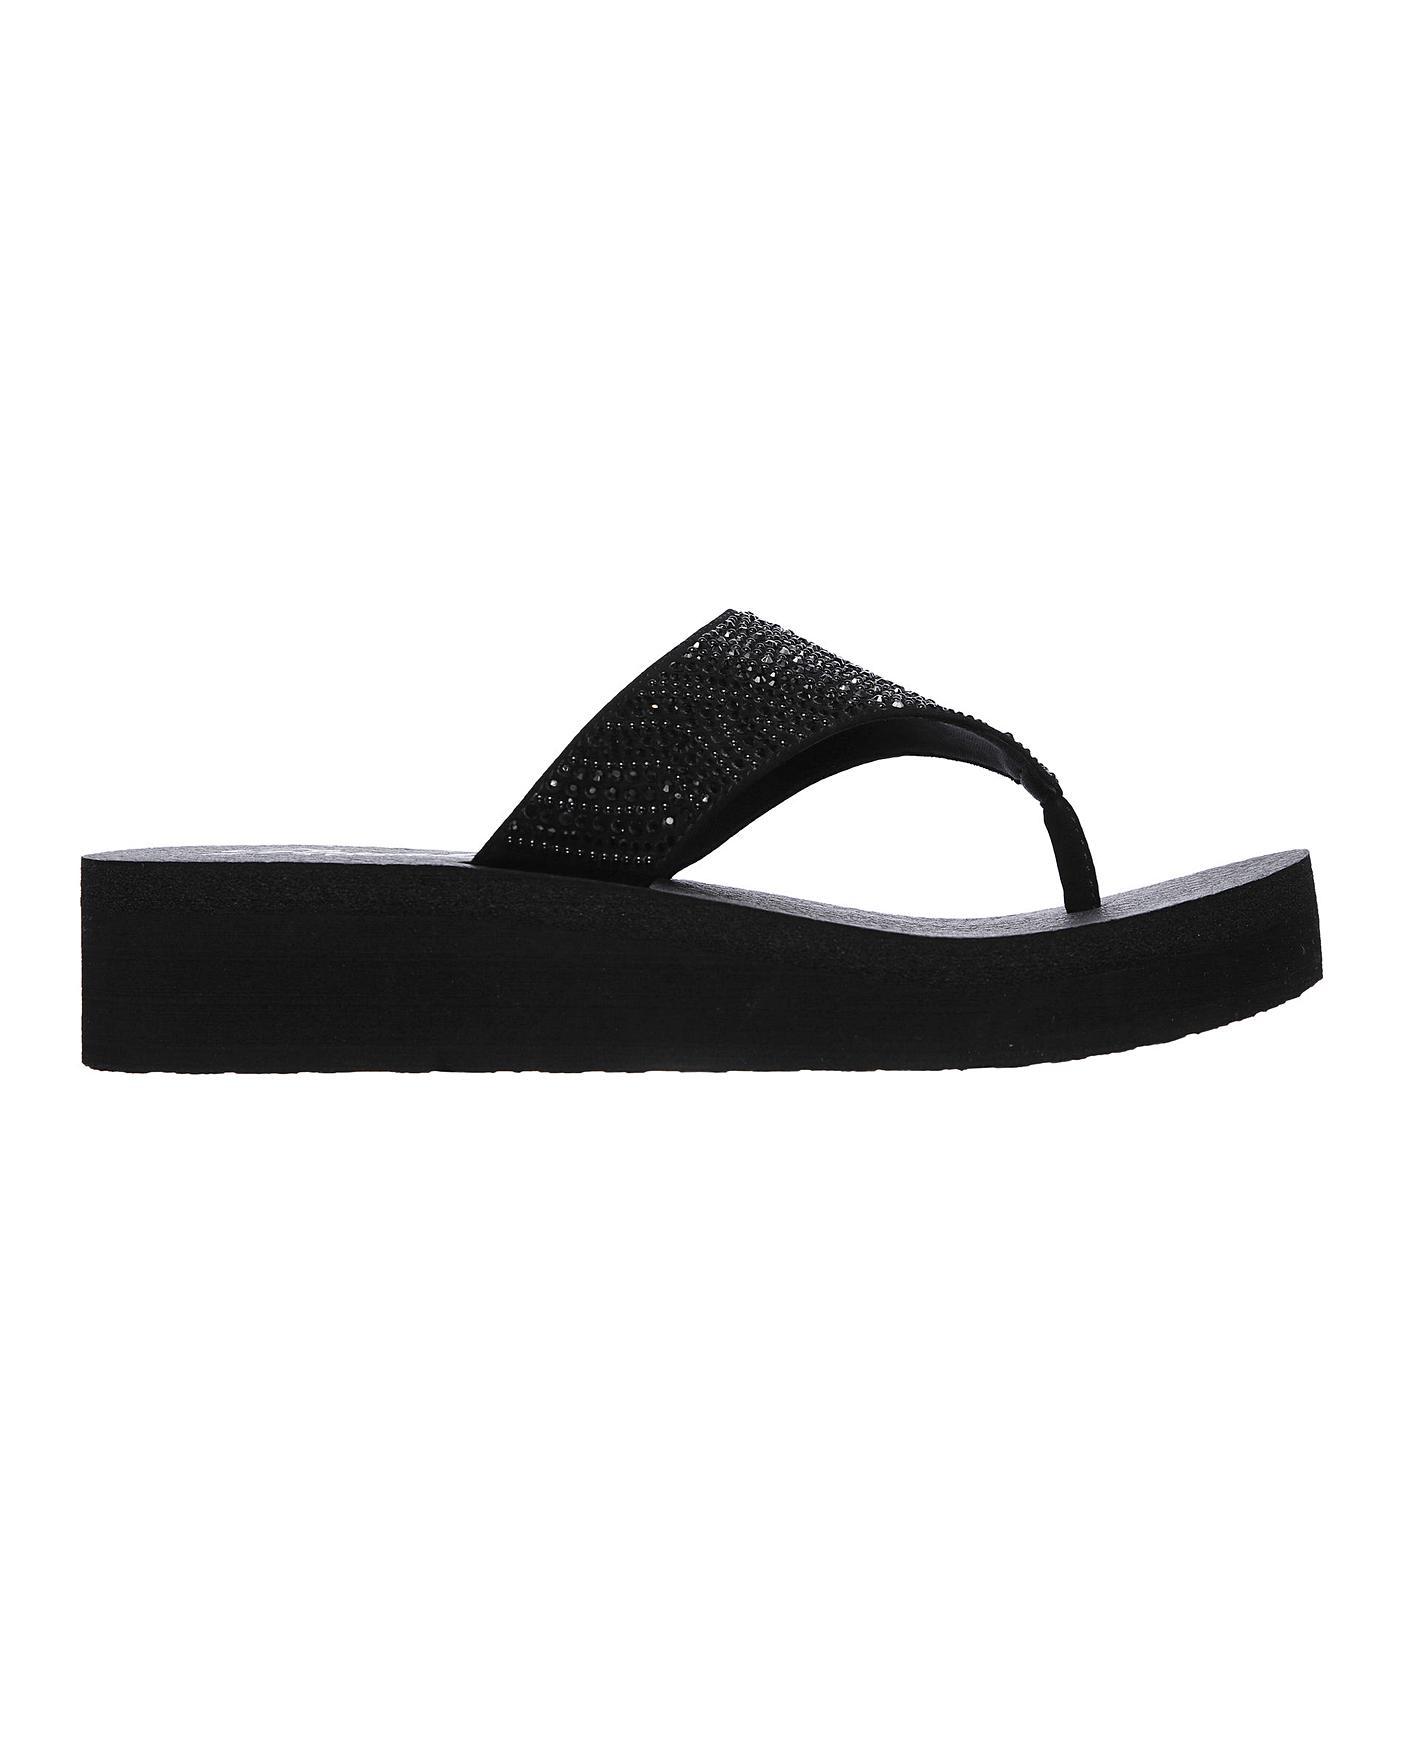 Skechers Toe Post Sandals   Oxendales